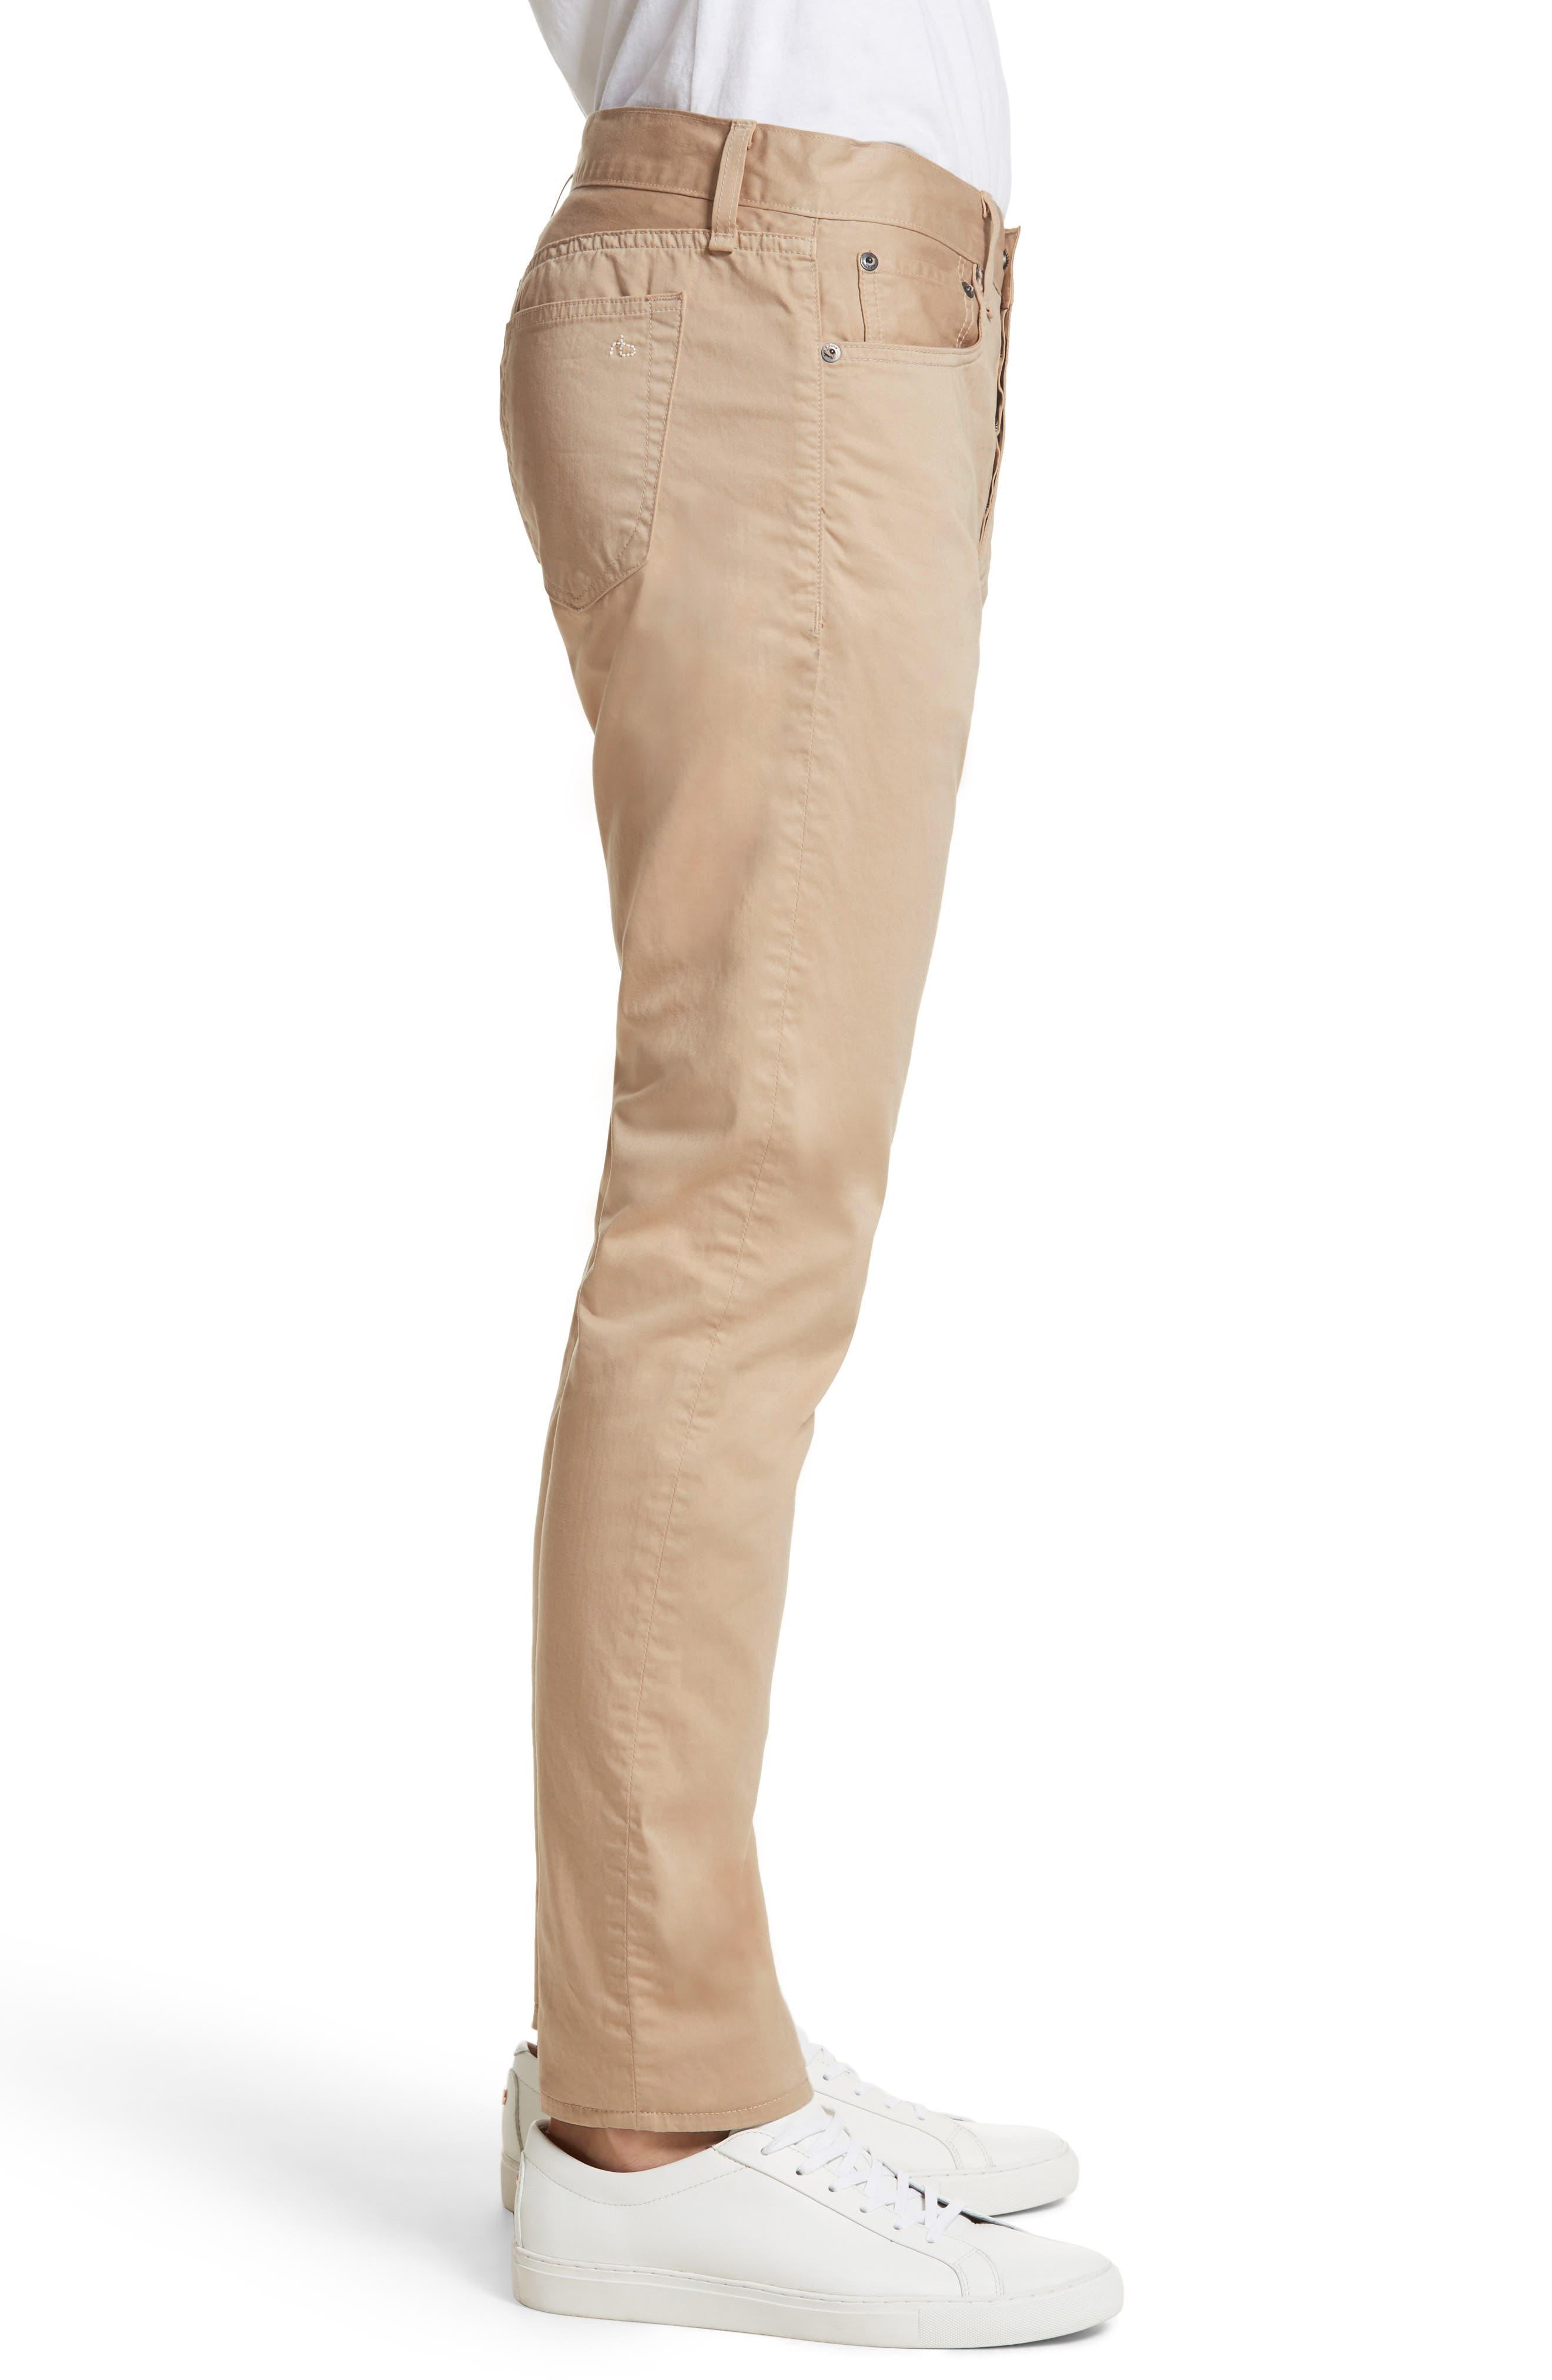 Fit 2 Five-Pocket Twill Pants,                             Alternate thumbnail 3, color,                             BEIGE